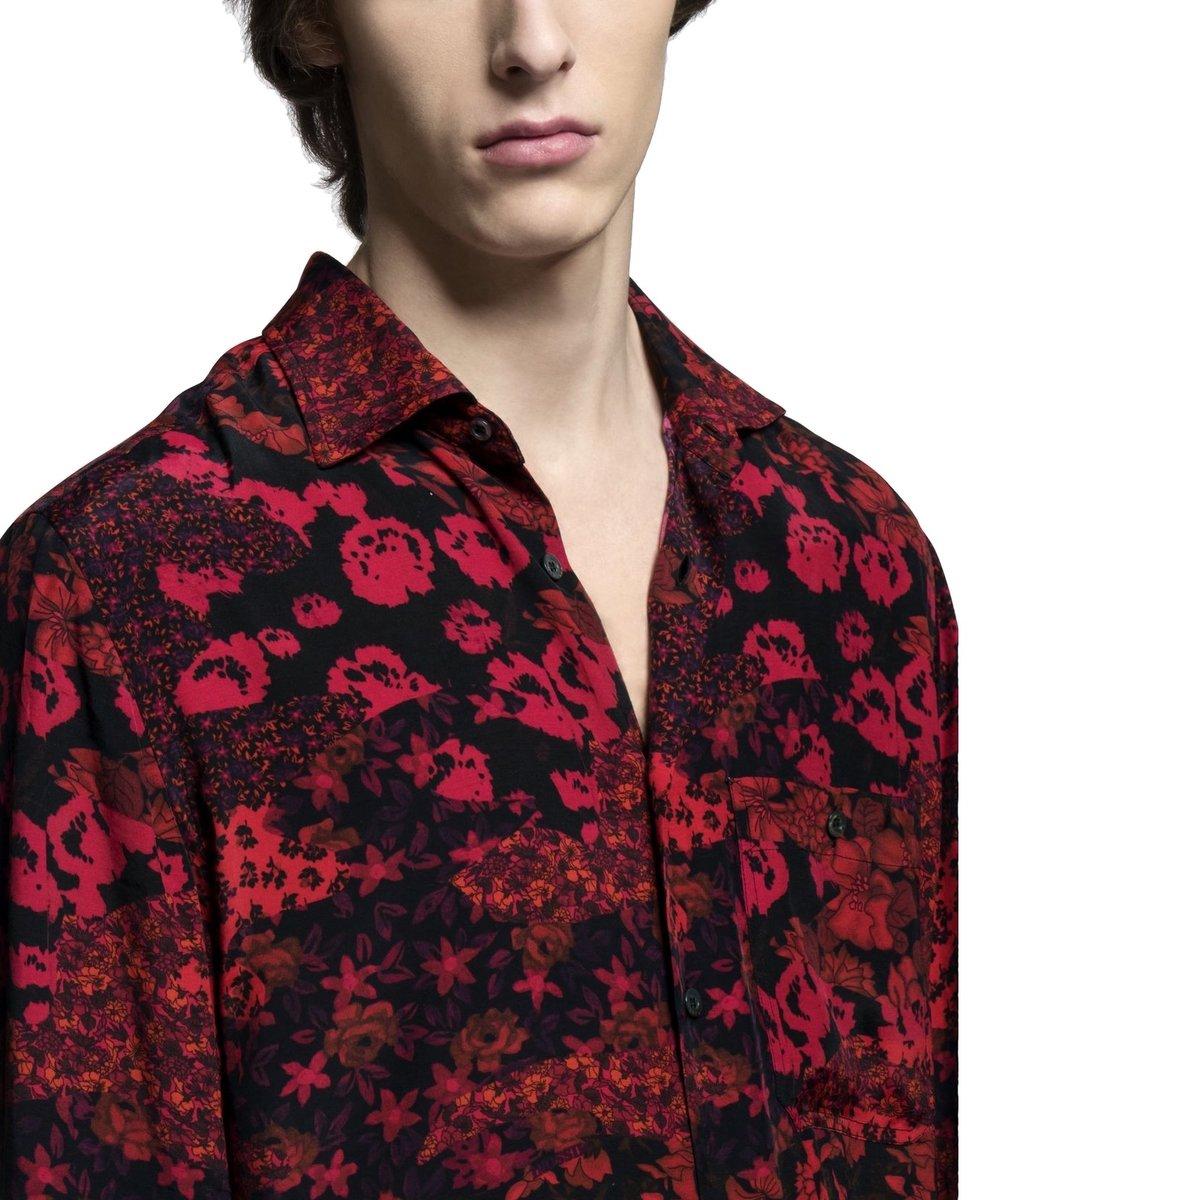 Missoni Red Floral Shirt Viscose 4.jpg